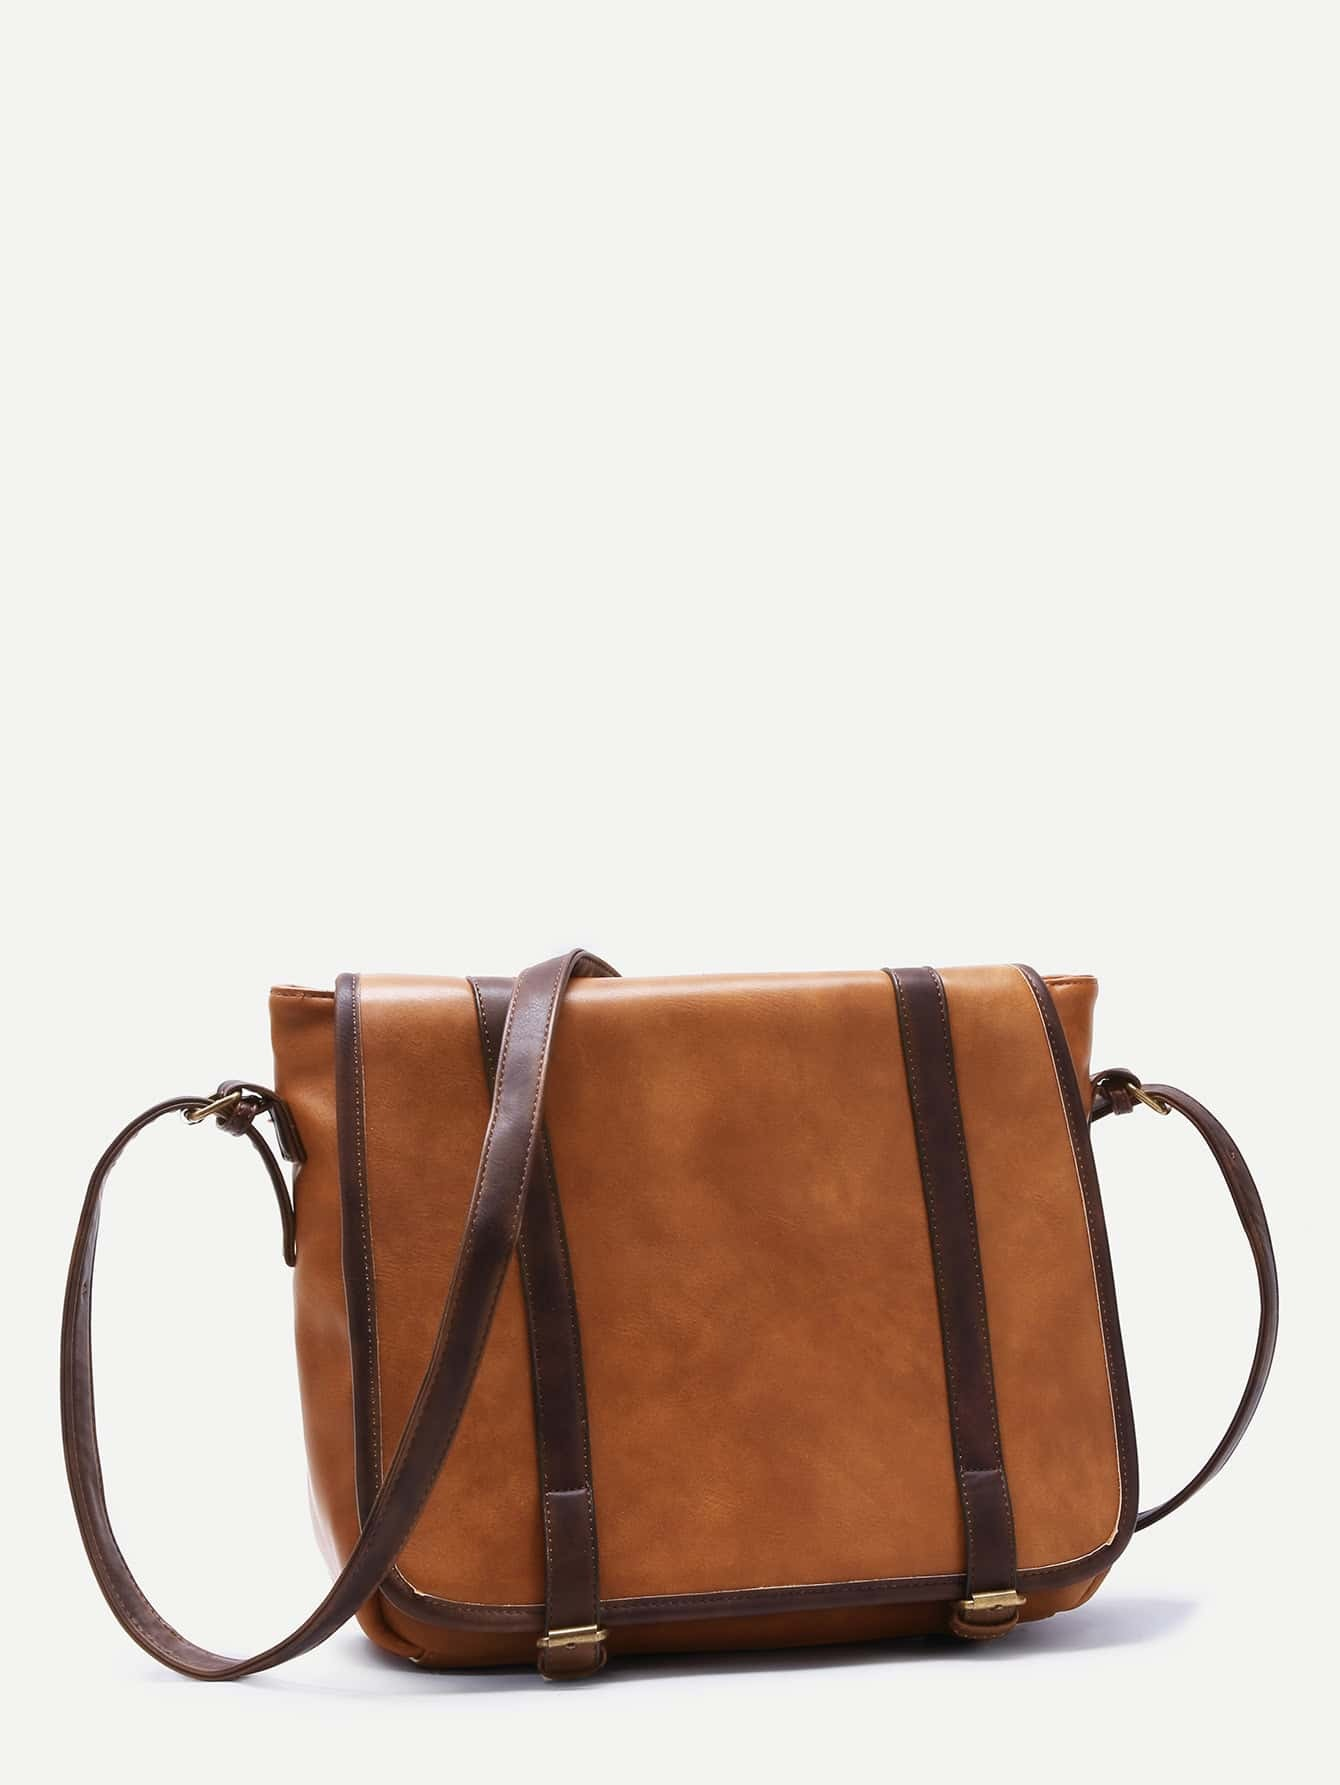 bag161123916_2